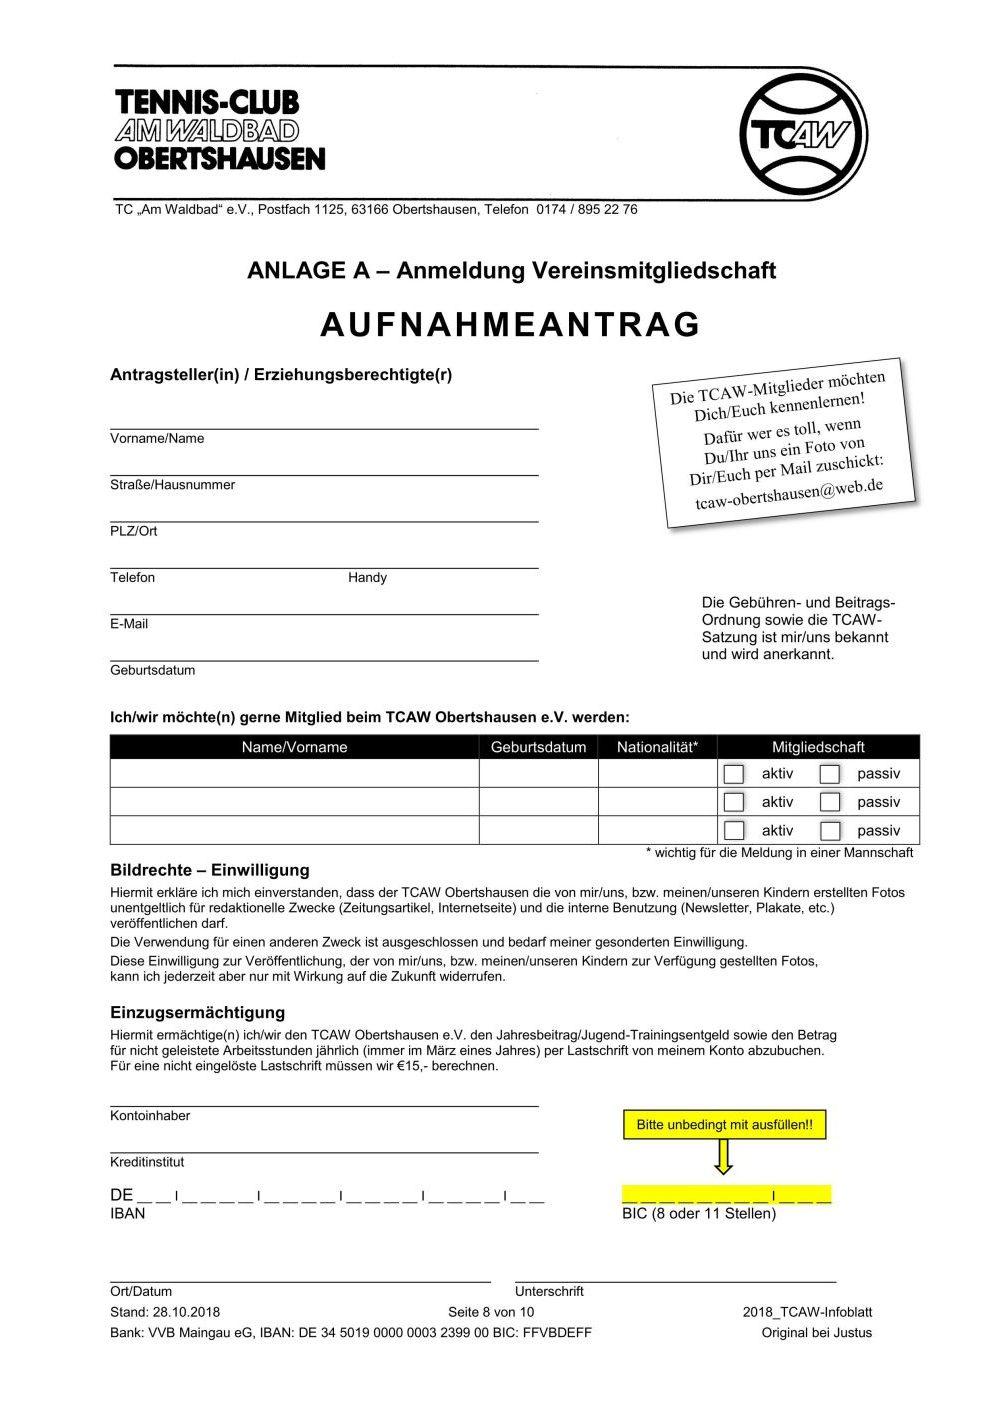 2018_TCAW-Infoblatt_08_V6_1000x1414